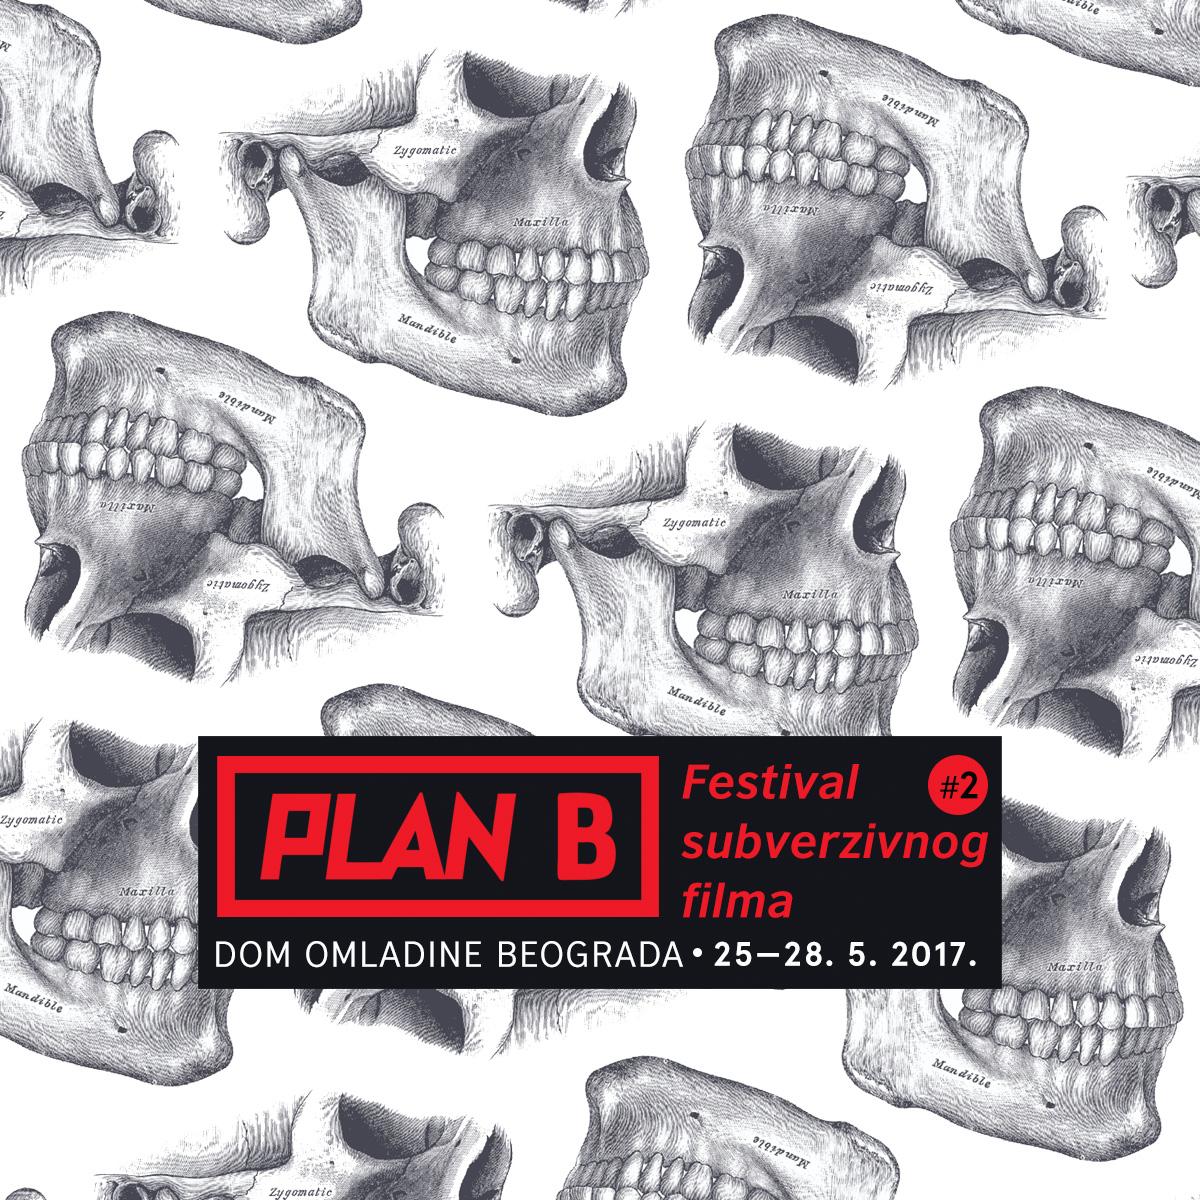 PLAN B festival u Domu omladine